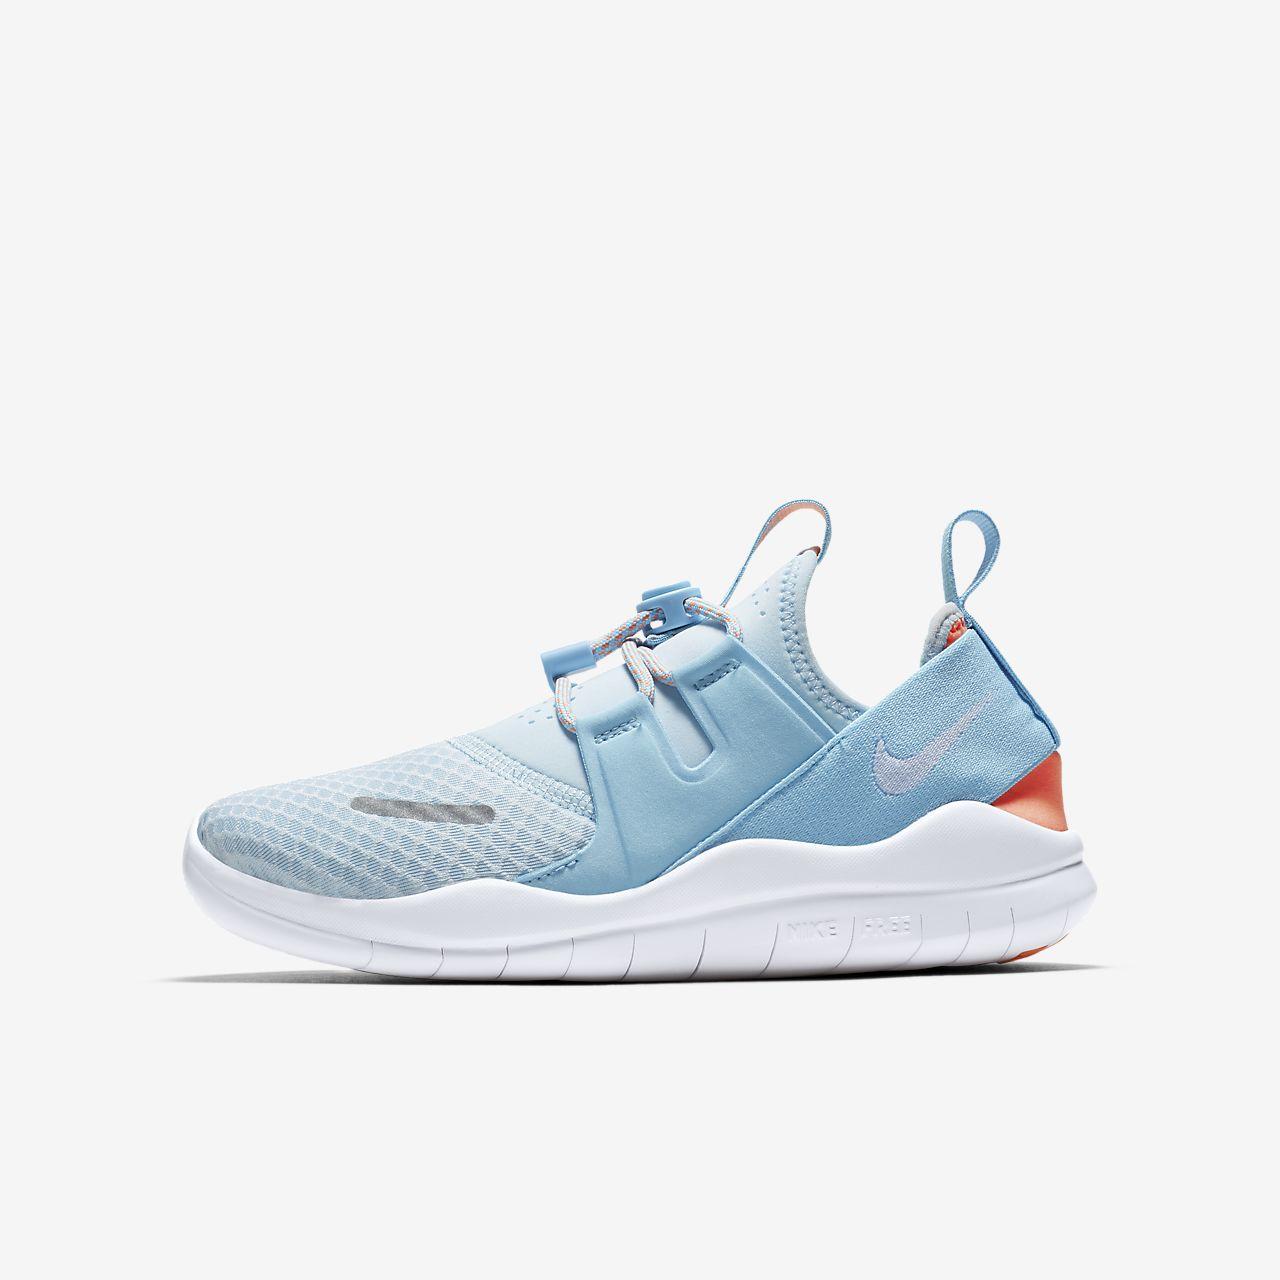 pretty nice d5290 80370 Nike Free RN Commuter 2018 Big Kids' Running Shoe